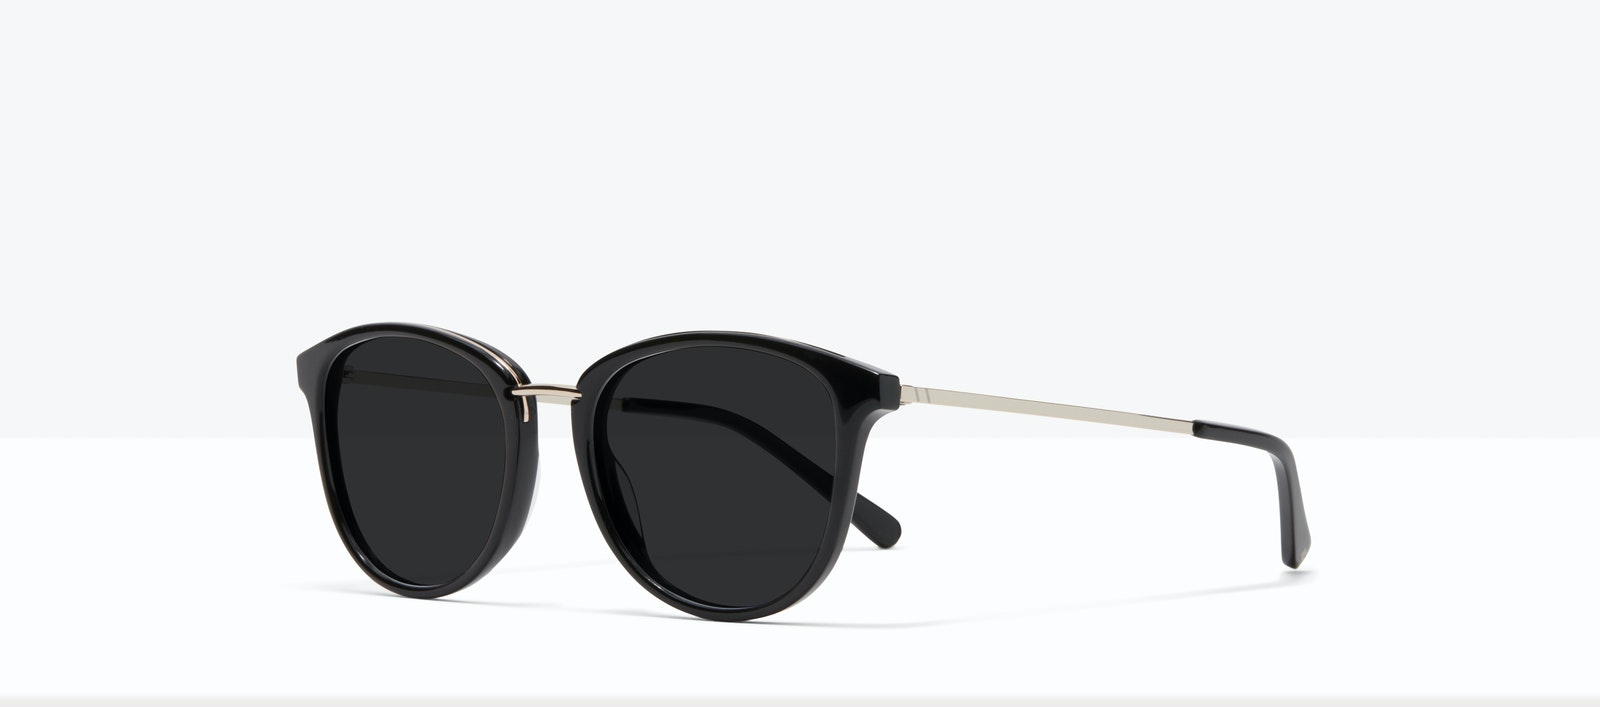 Affordable Fashion Glasses Square Round Sunglasses Women Bella XS Black Tilt